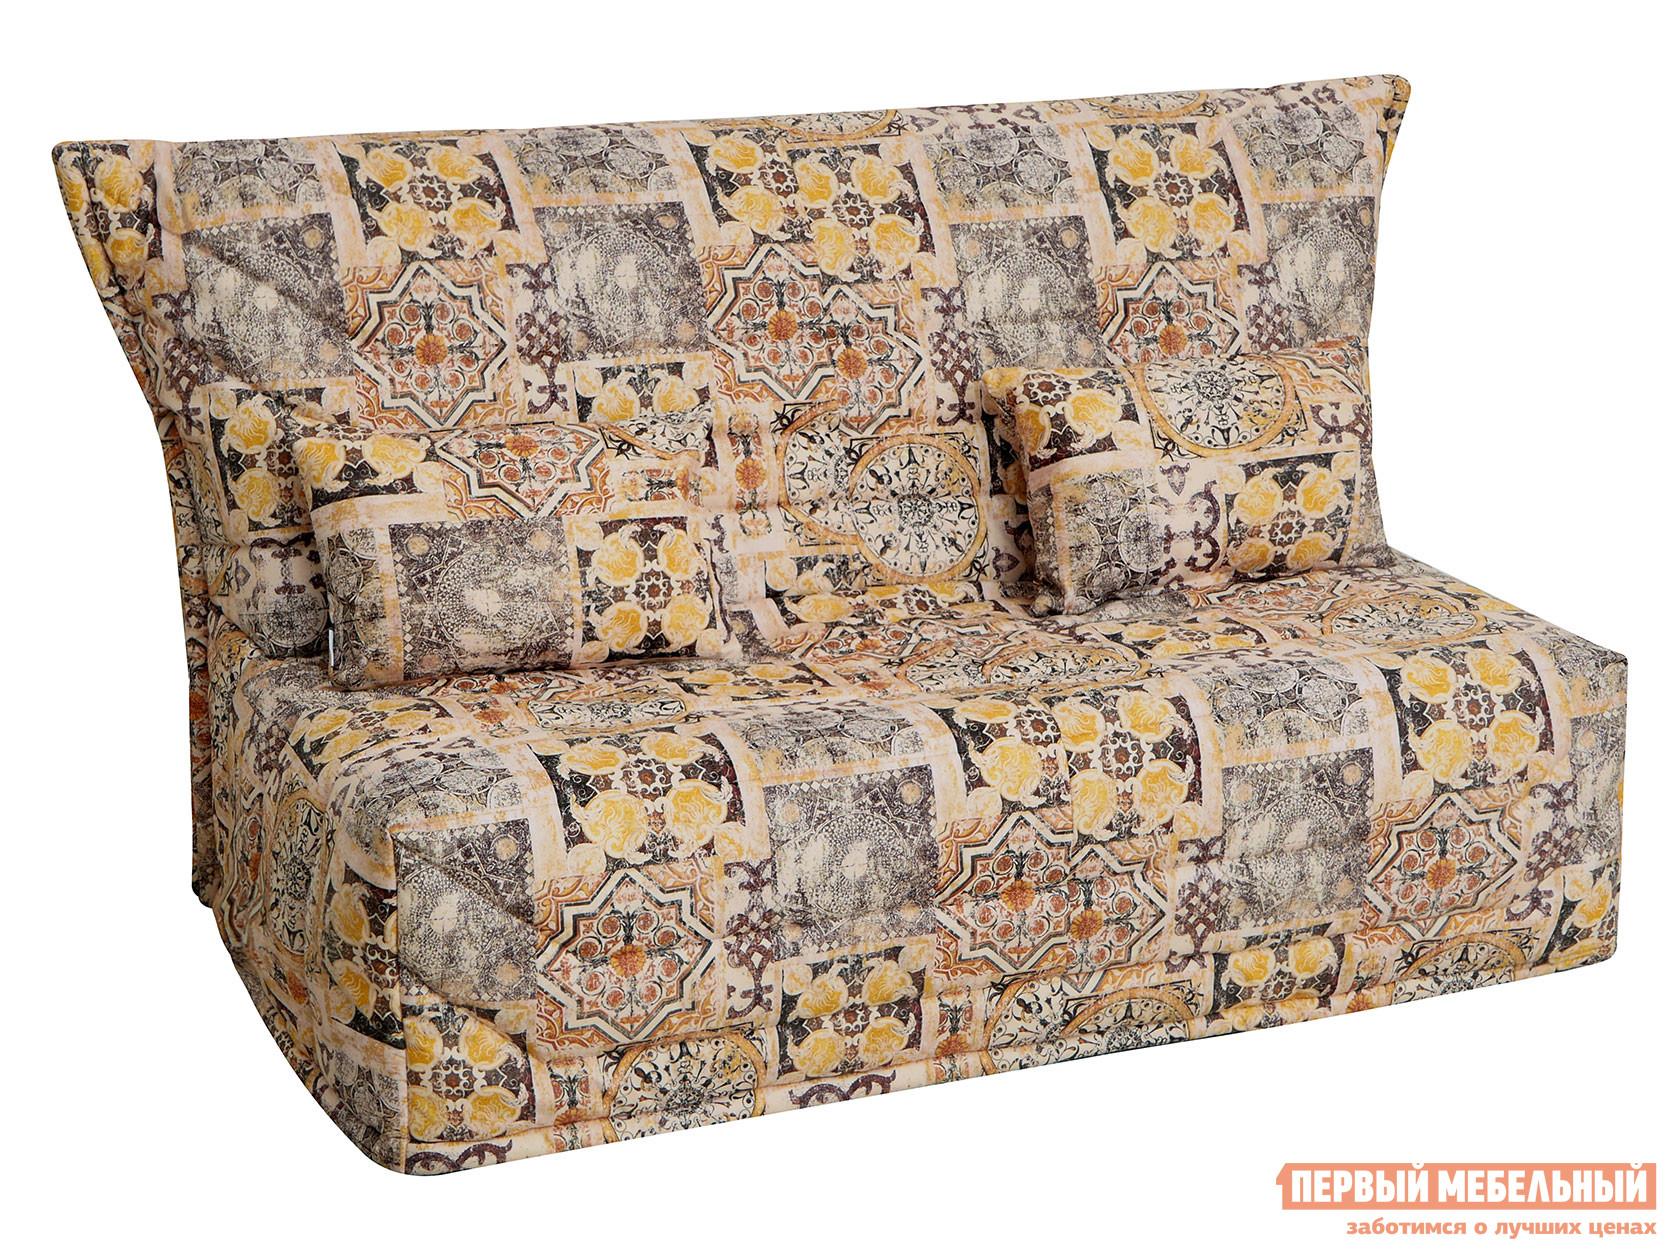 Прямой диван  Прямой диван Бьянка  Сиена, велюр, 1200 мм